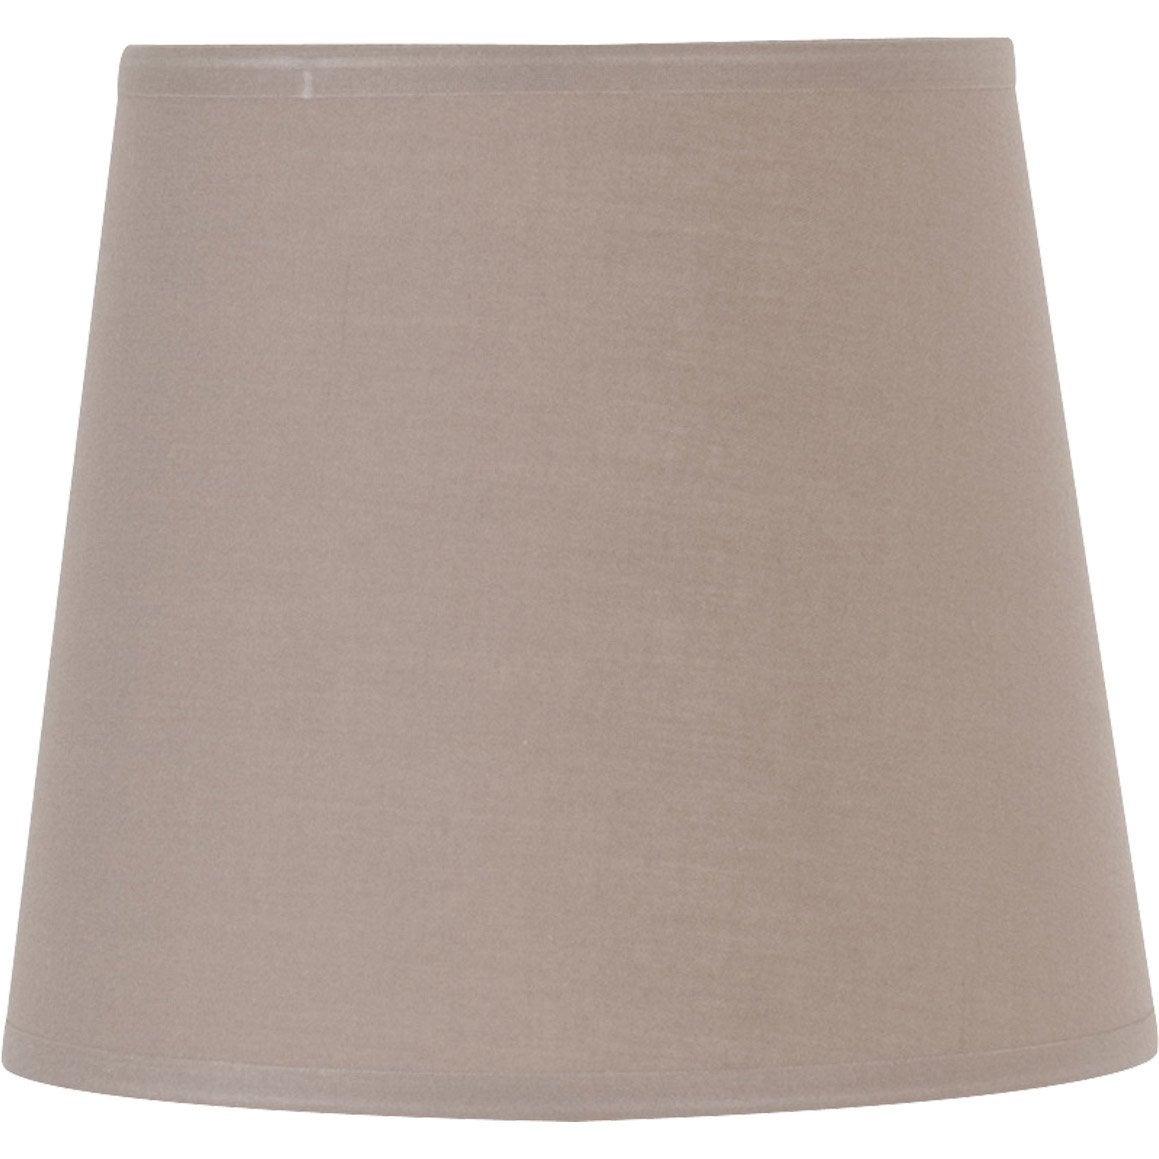 abat jour conique 14 cm toiline brun taupe n 3 inspire. Black Bedroom Furniture Sets. Home Design Ideas